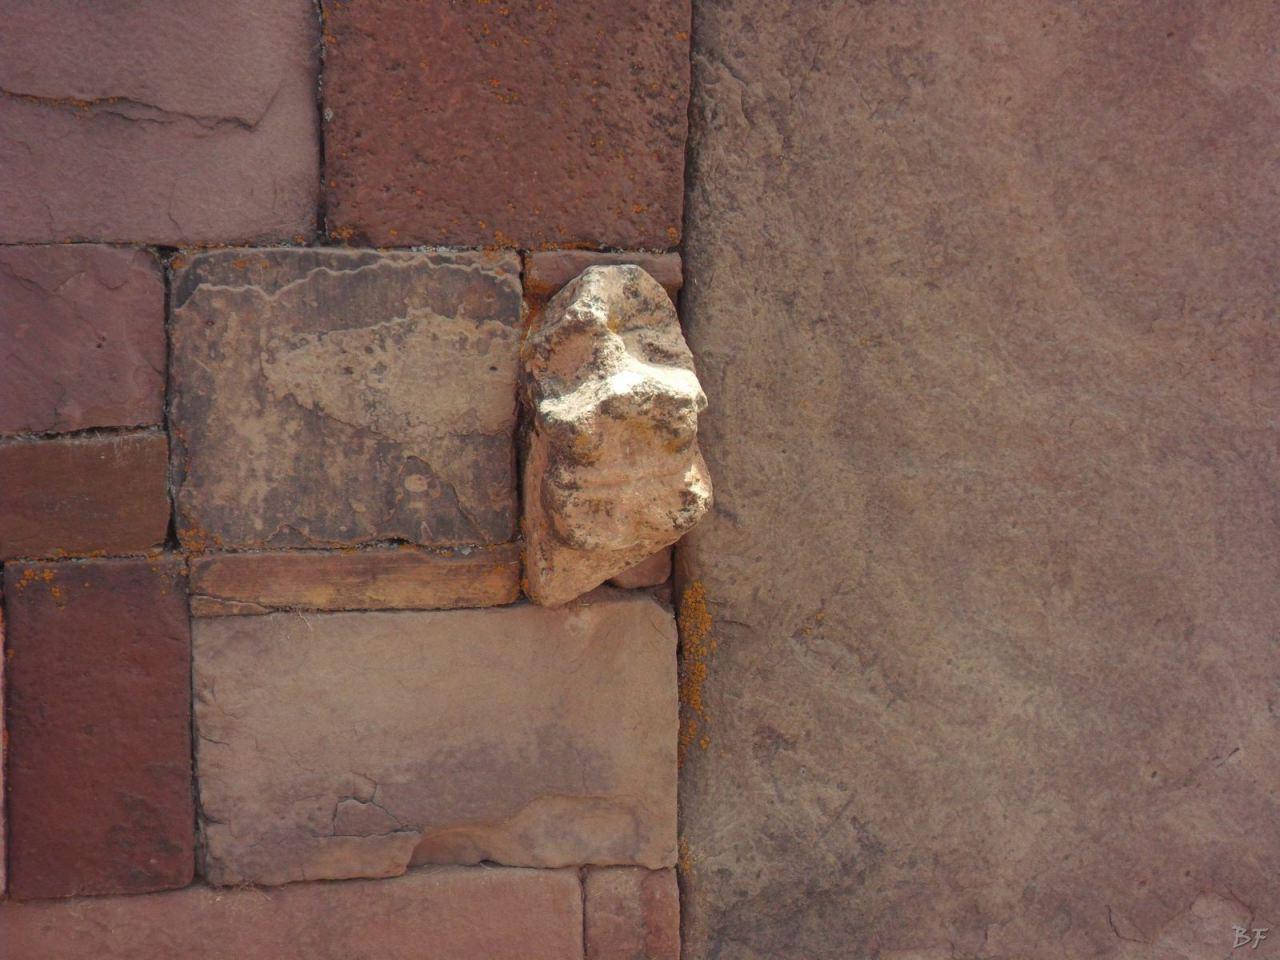 Sito-Megalitico-Piramide-Akapana-Kalasasaya-Menhir-Tiahuanaco-Bolivia-84